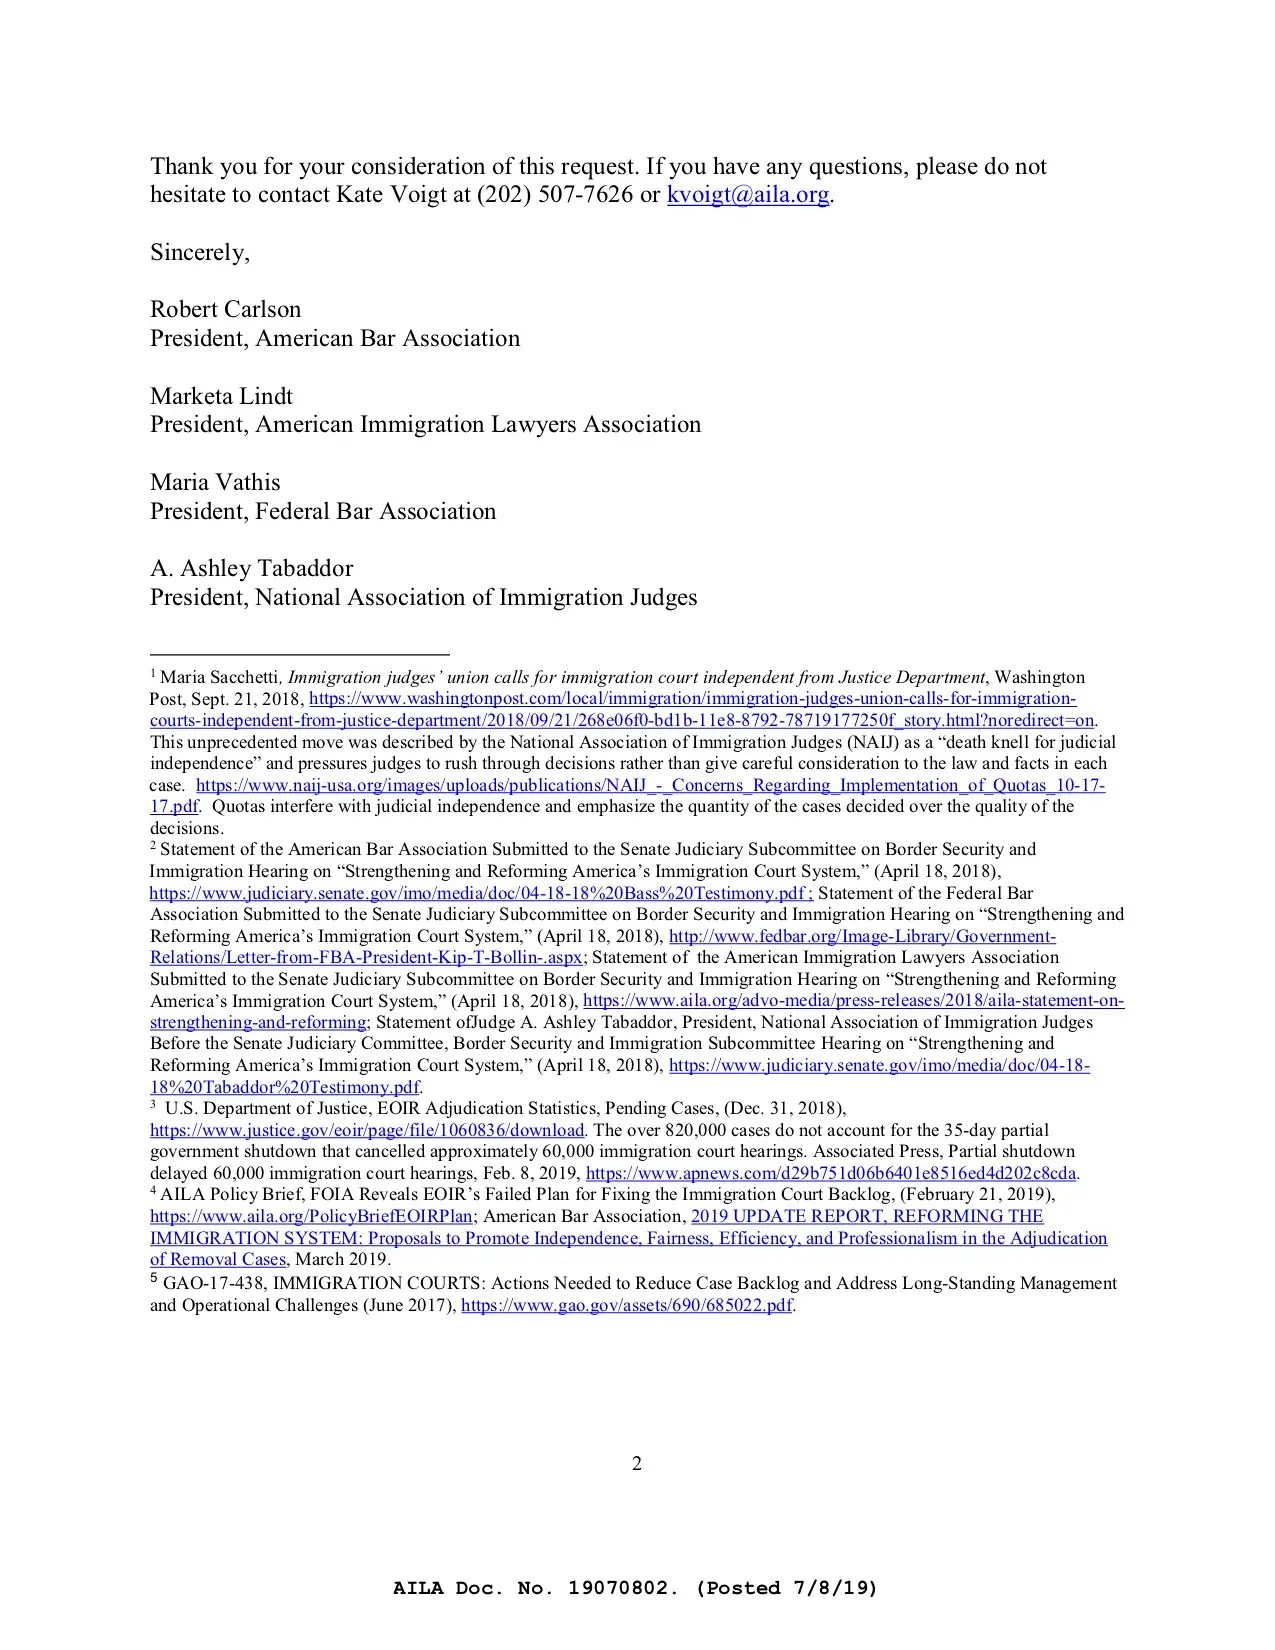 Independent Immigration Court letter pg. 2